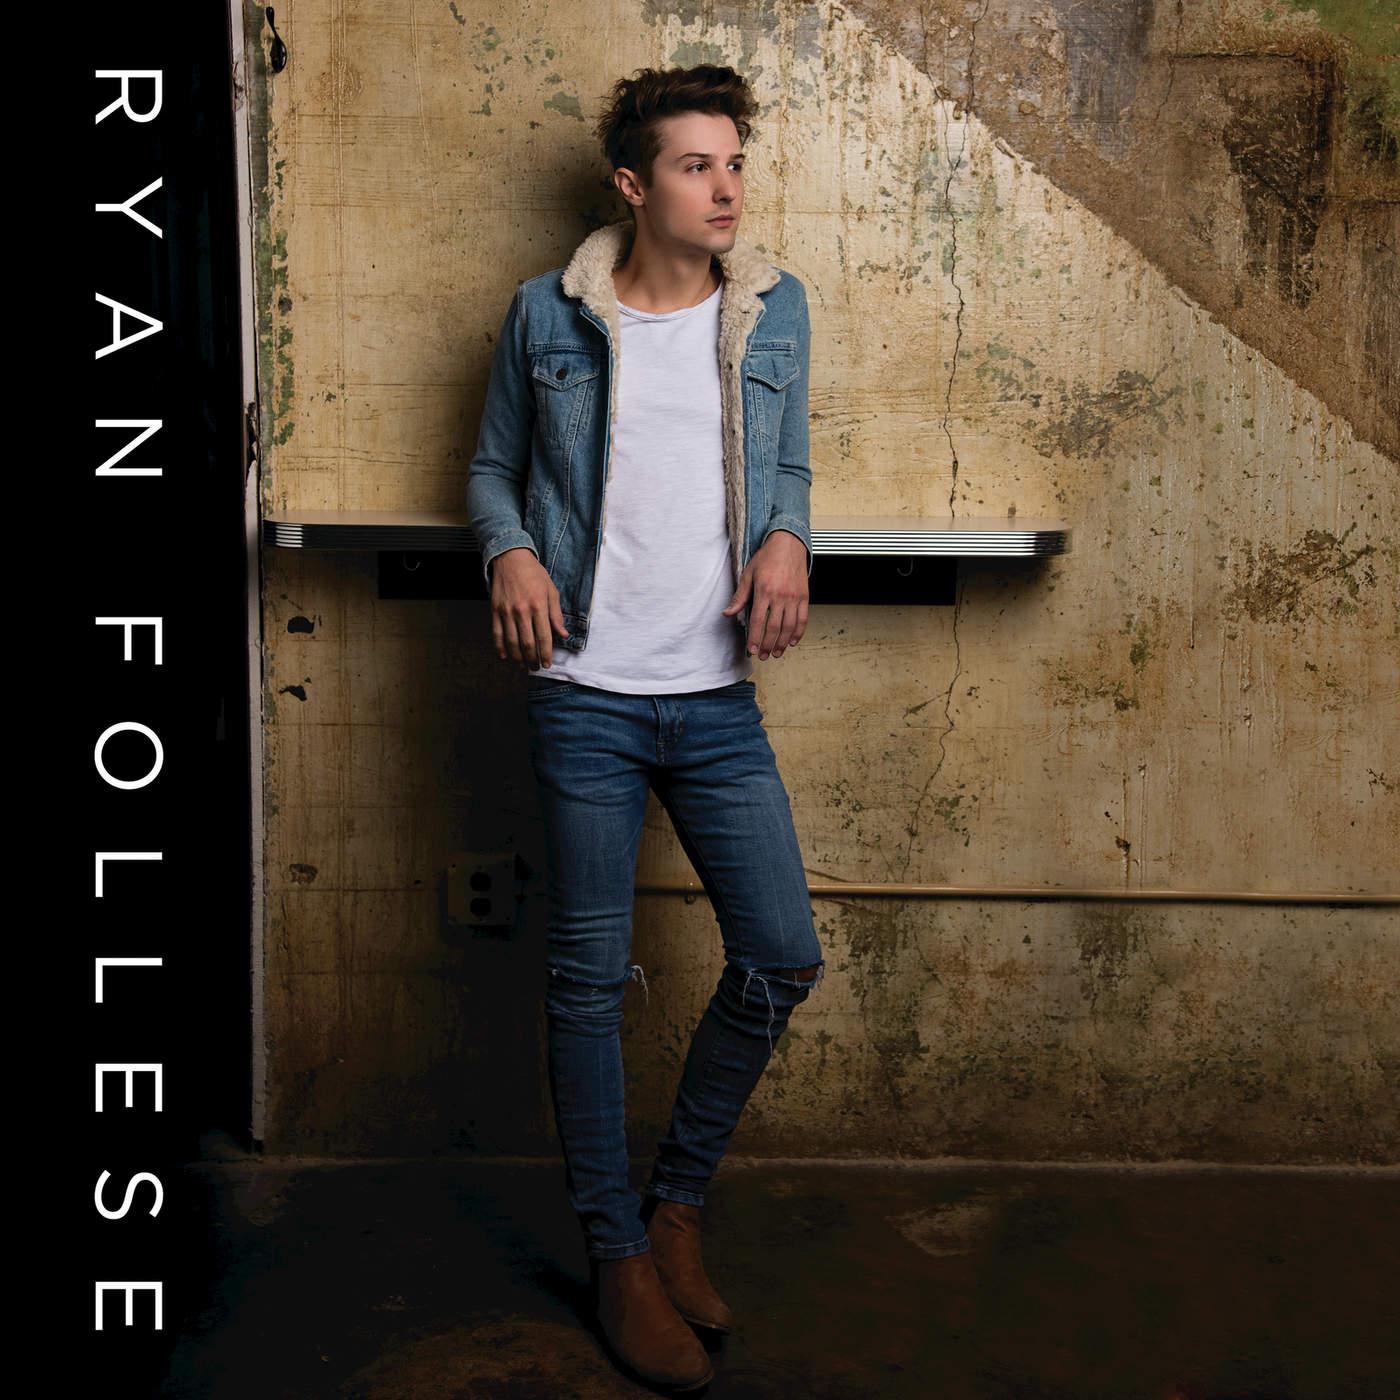 Ryan Follese - Ryan Follese